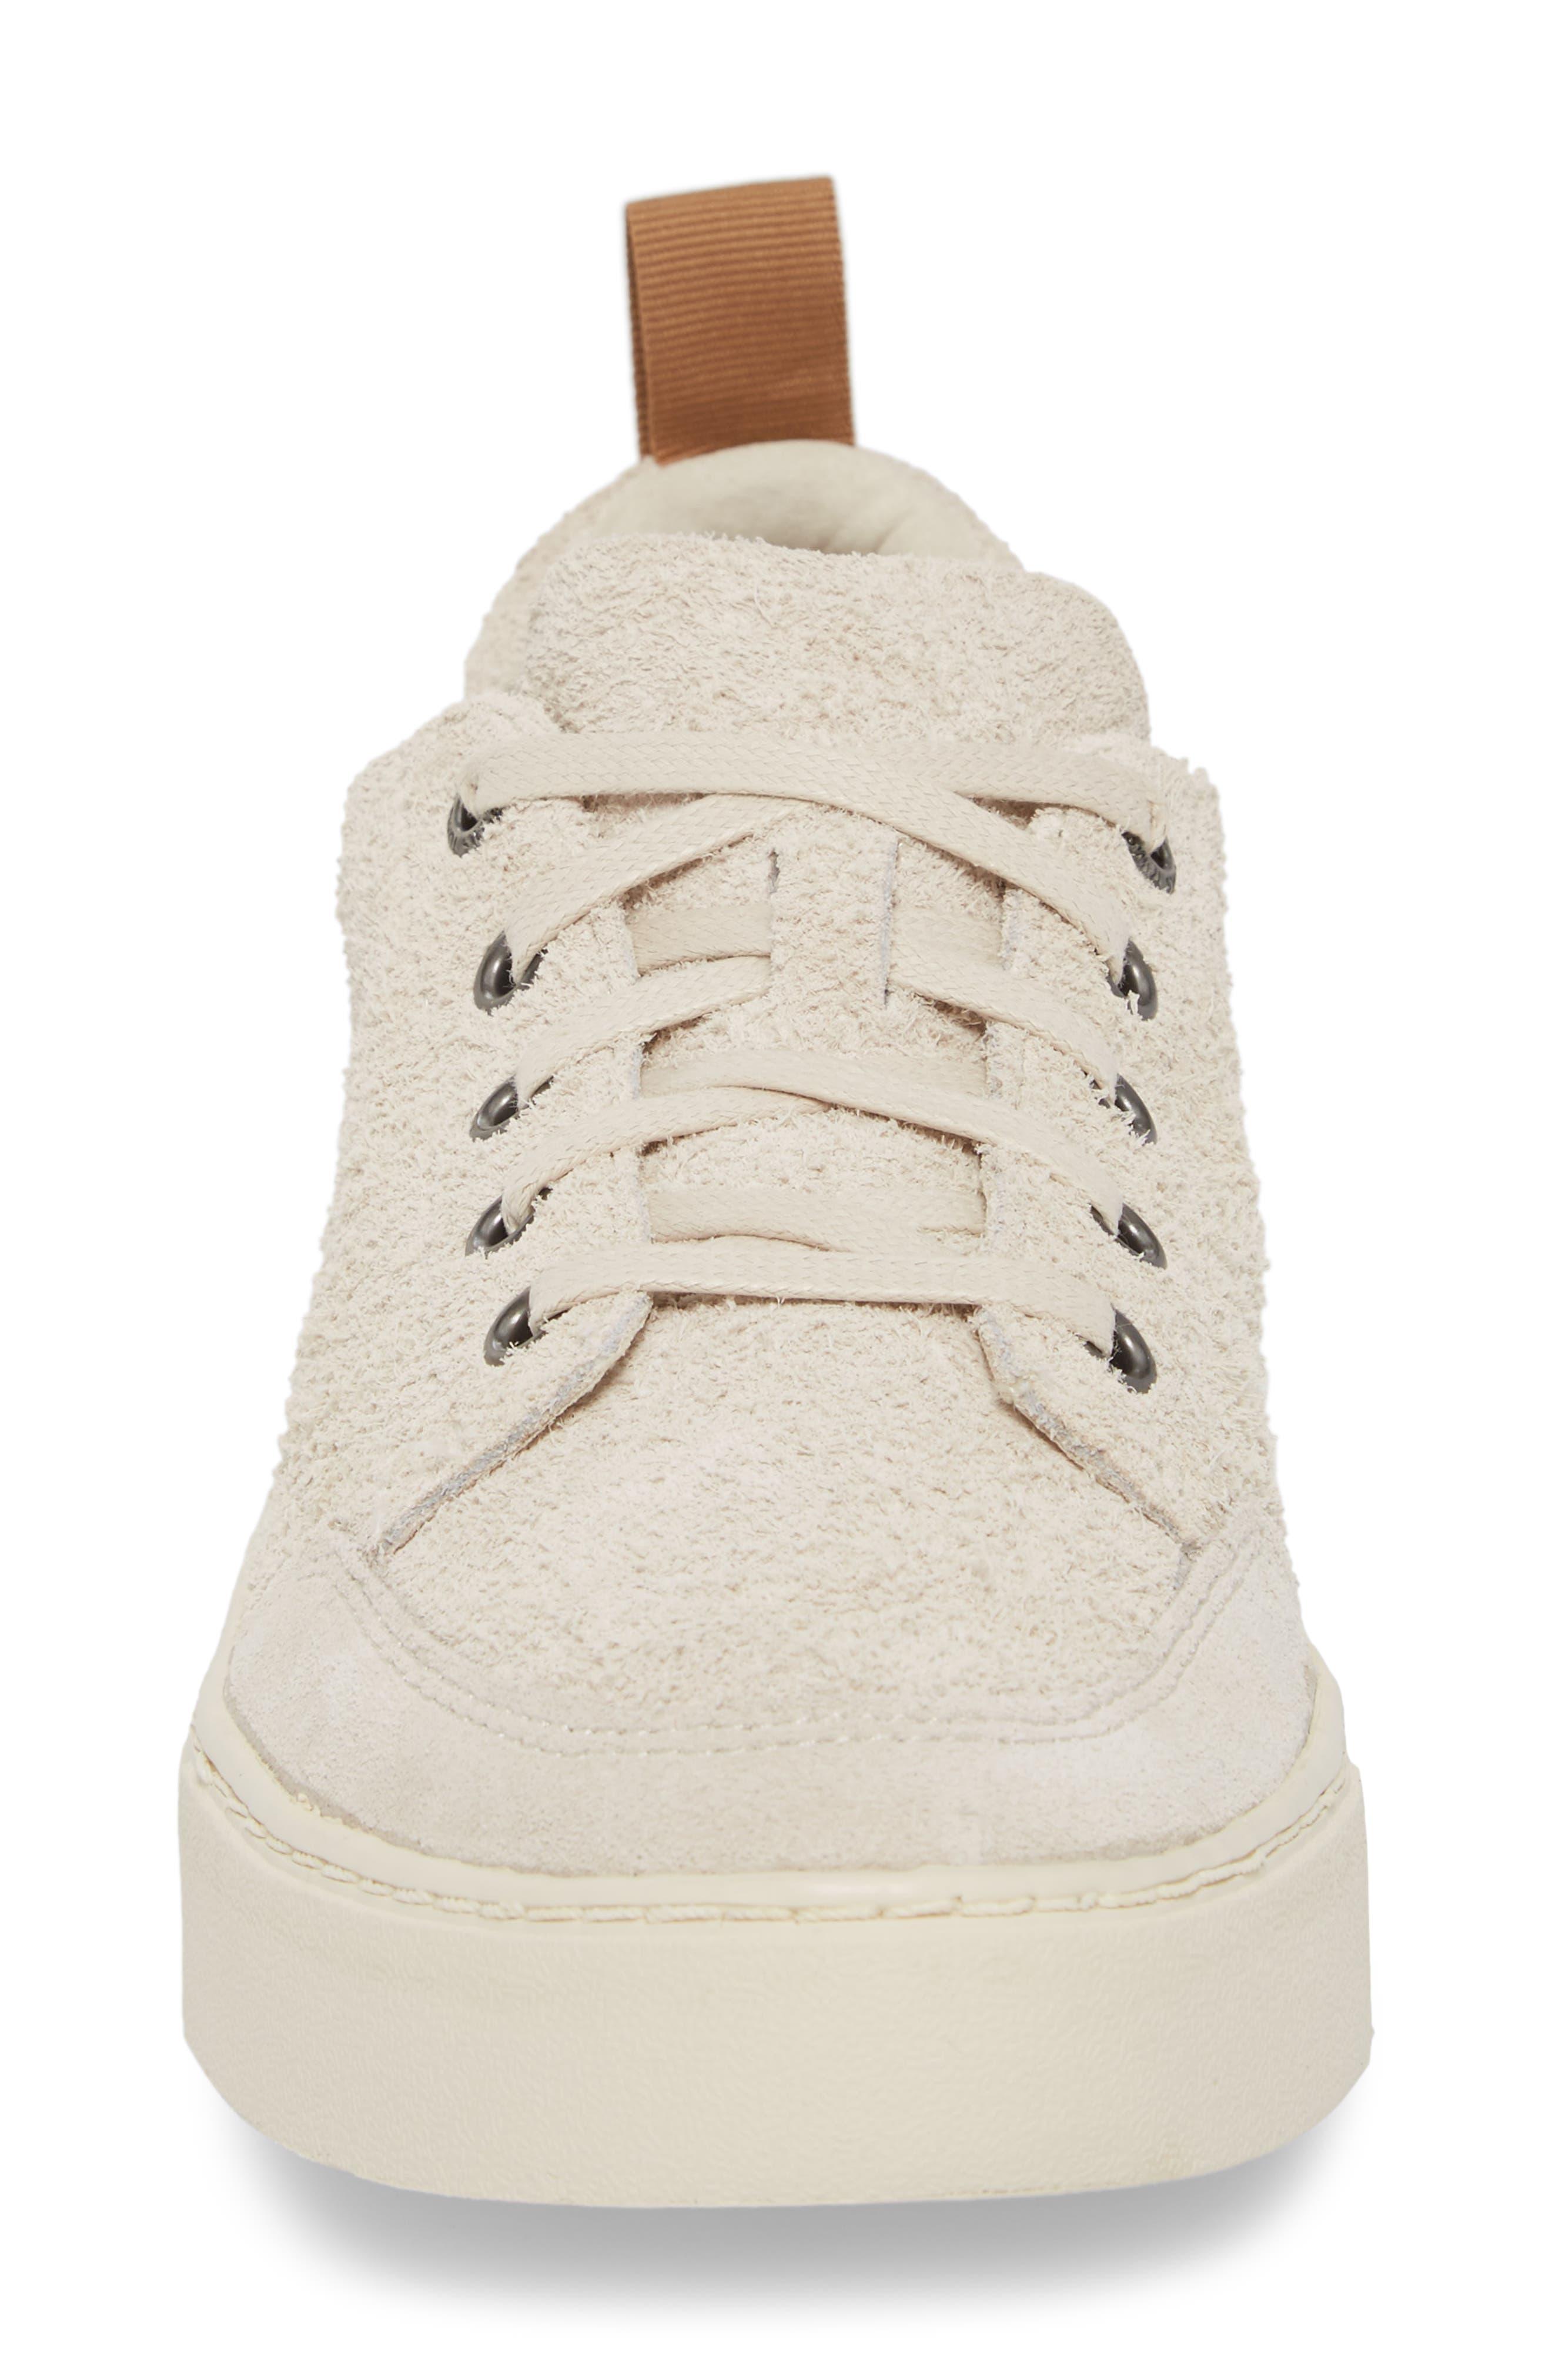 Landen Sneaker,                             Alternate thumbnail 4, color,                             BIRCH SHAGGY SUEDE